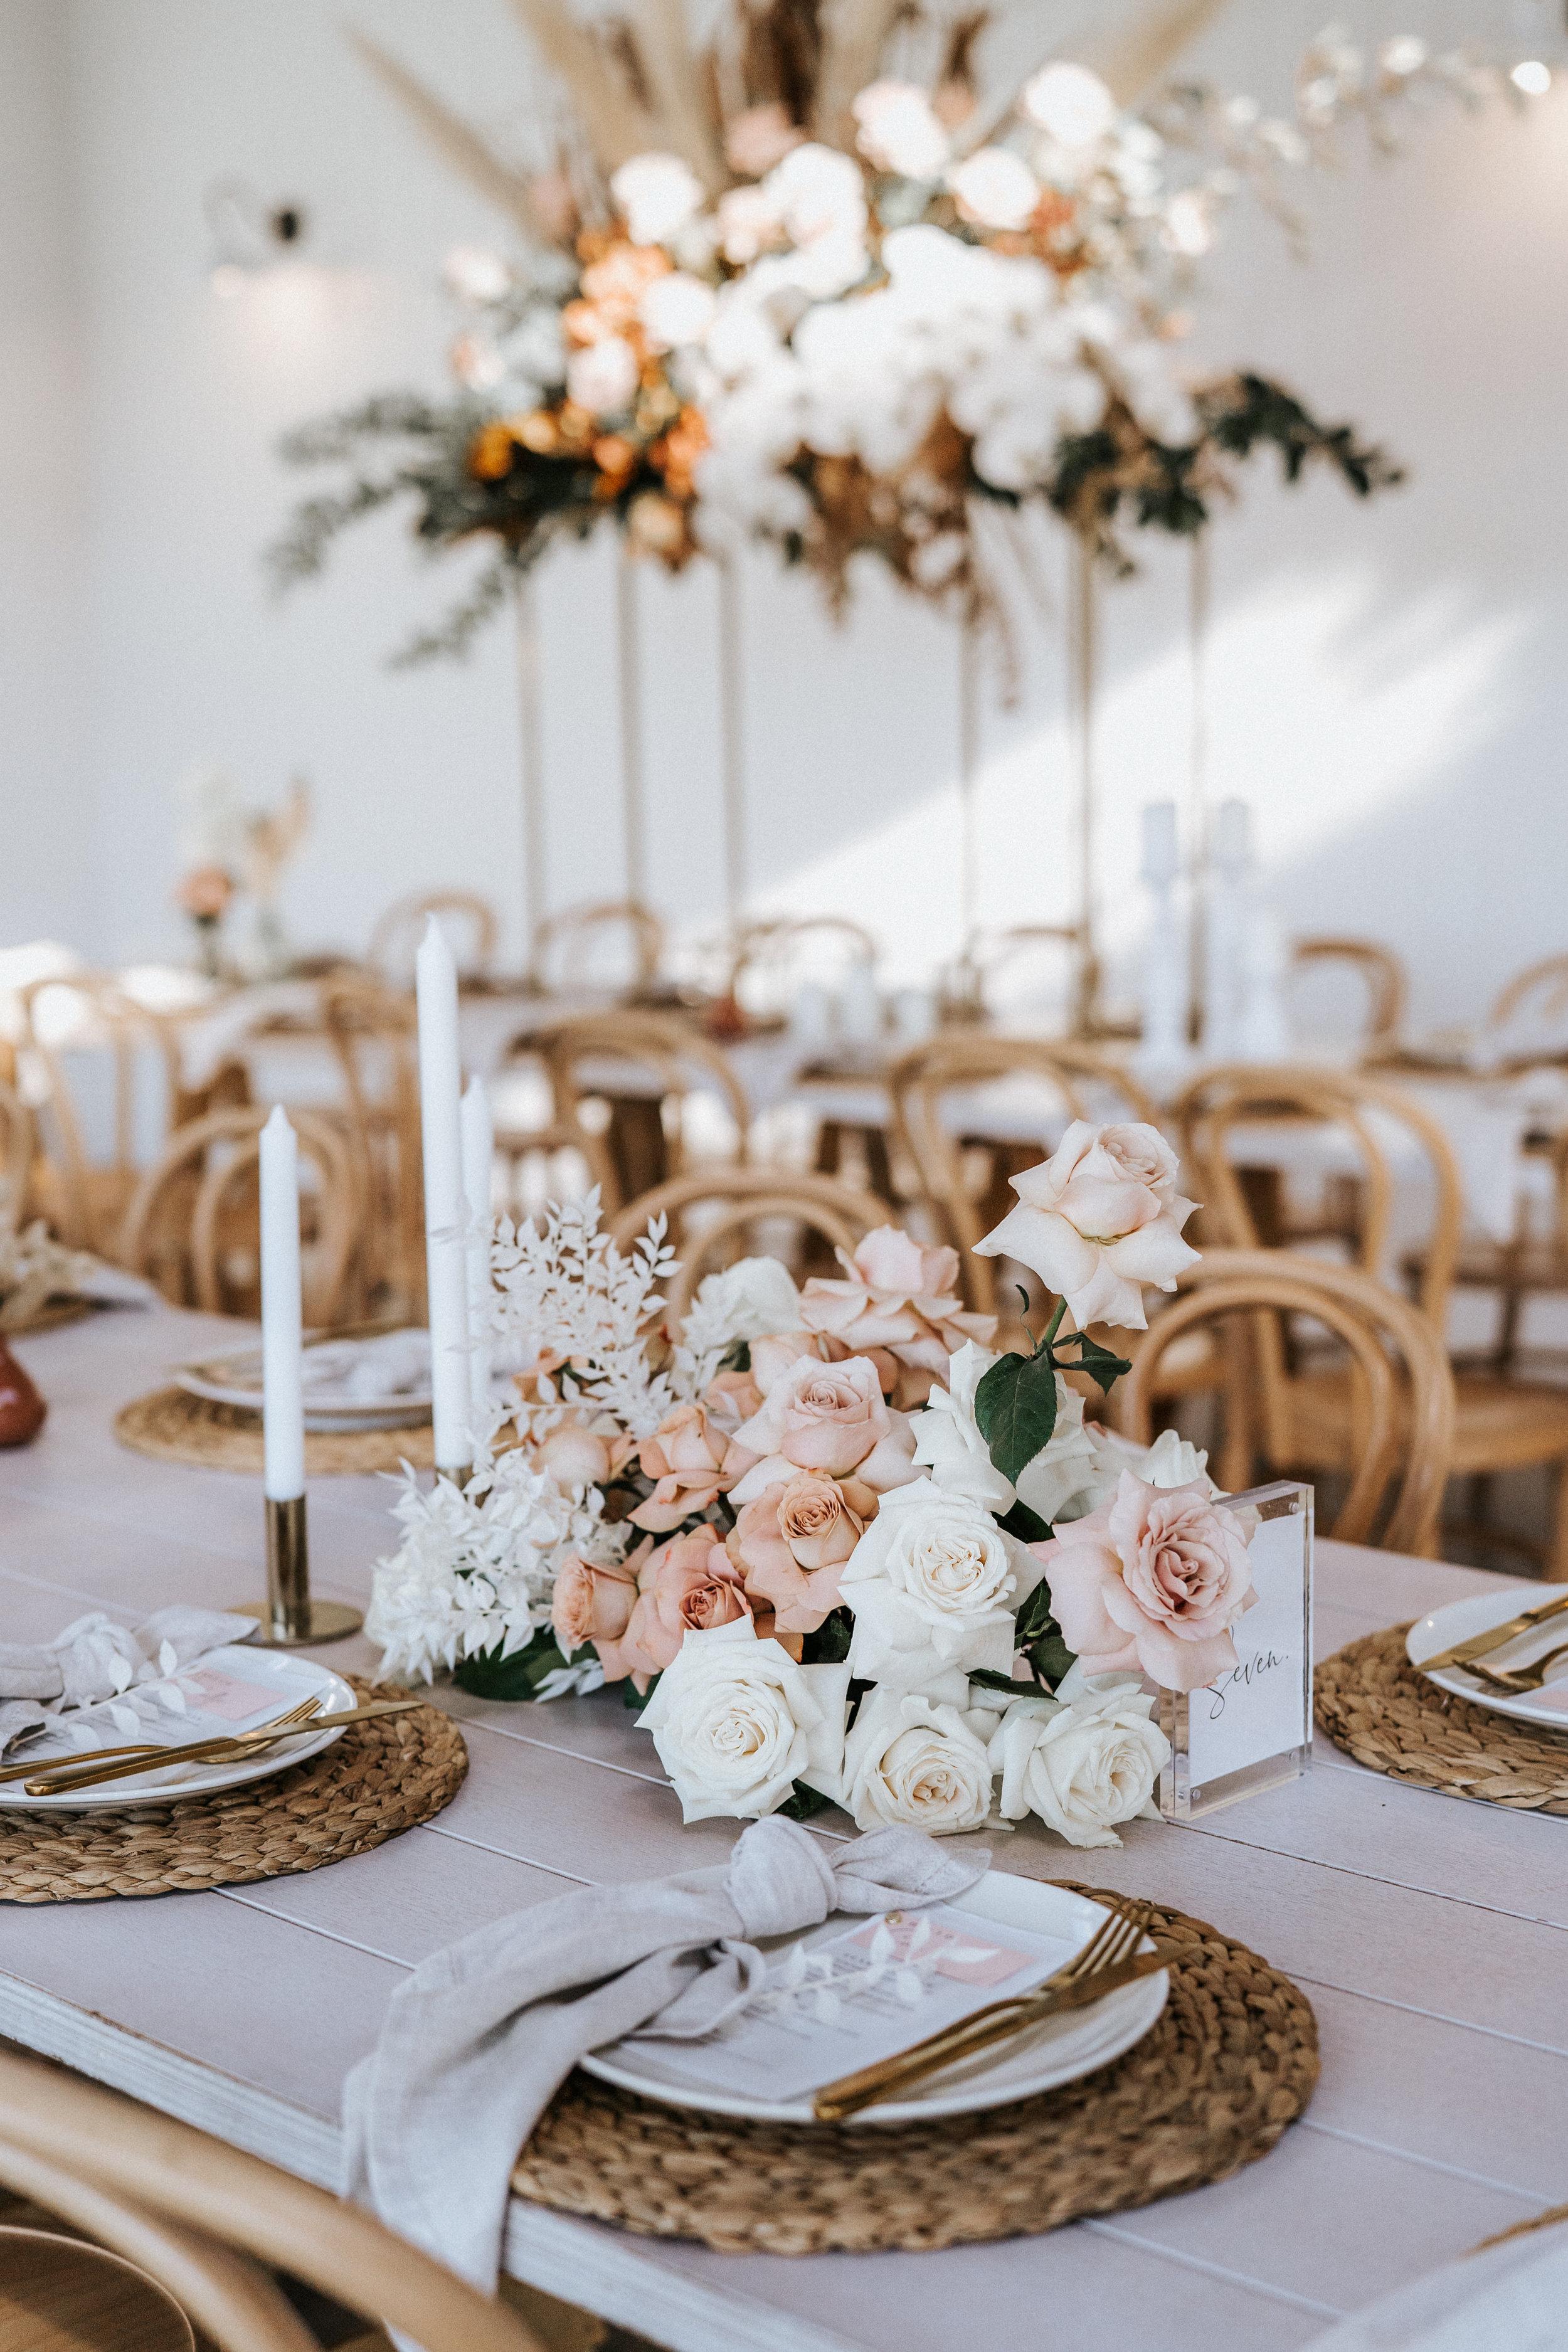 gemaya-tim-bilmon-wedding-33.jpg